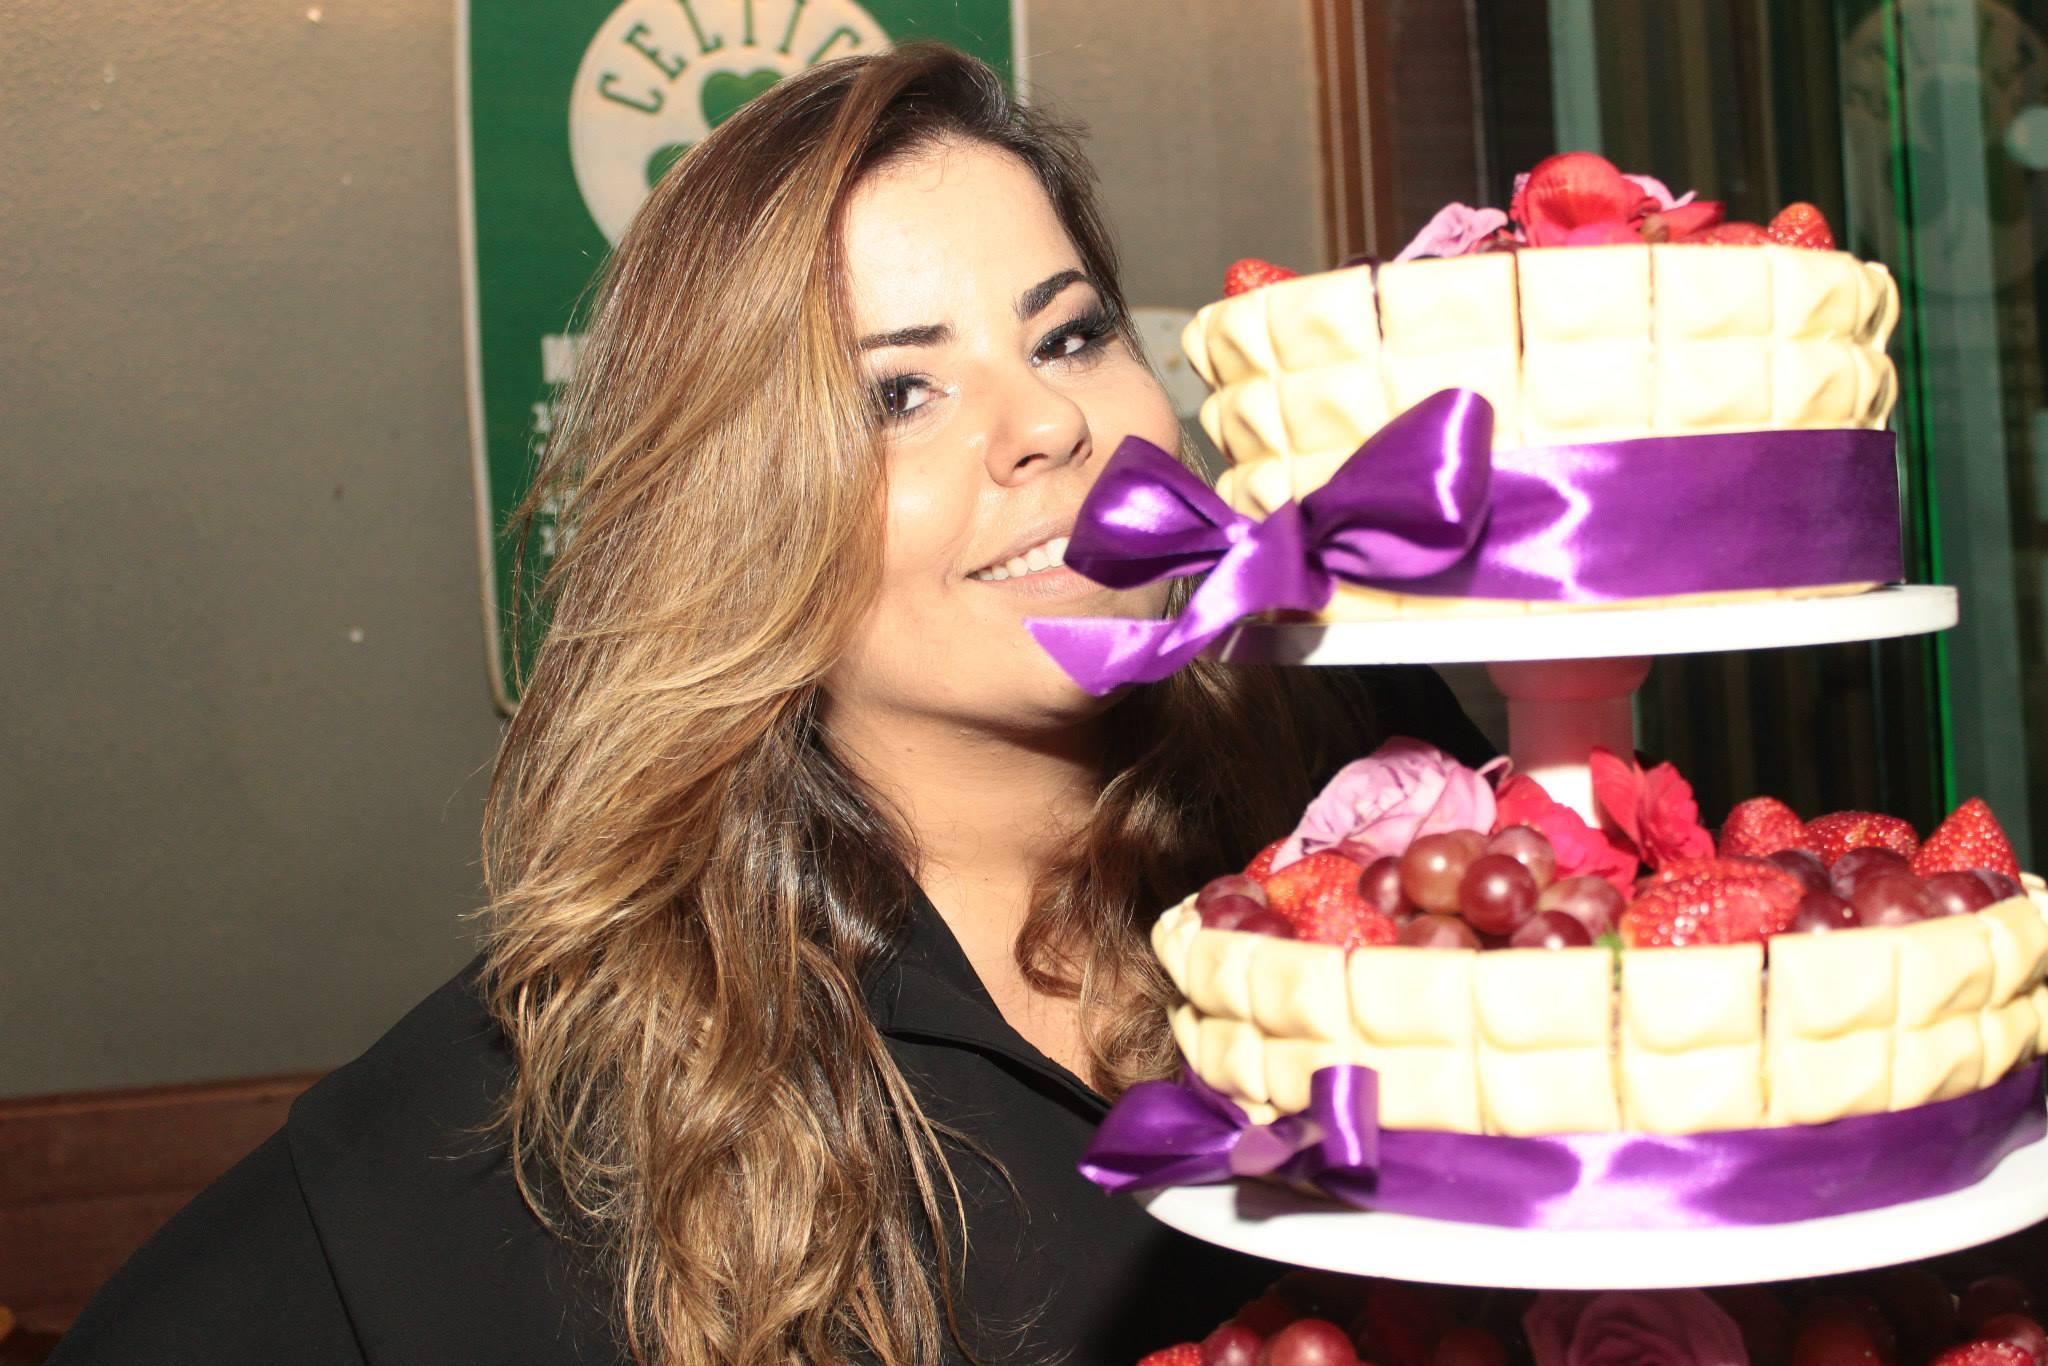 Maria Marina Meggiolaro comemora aniversário